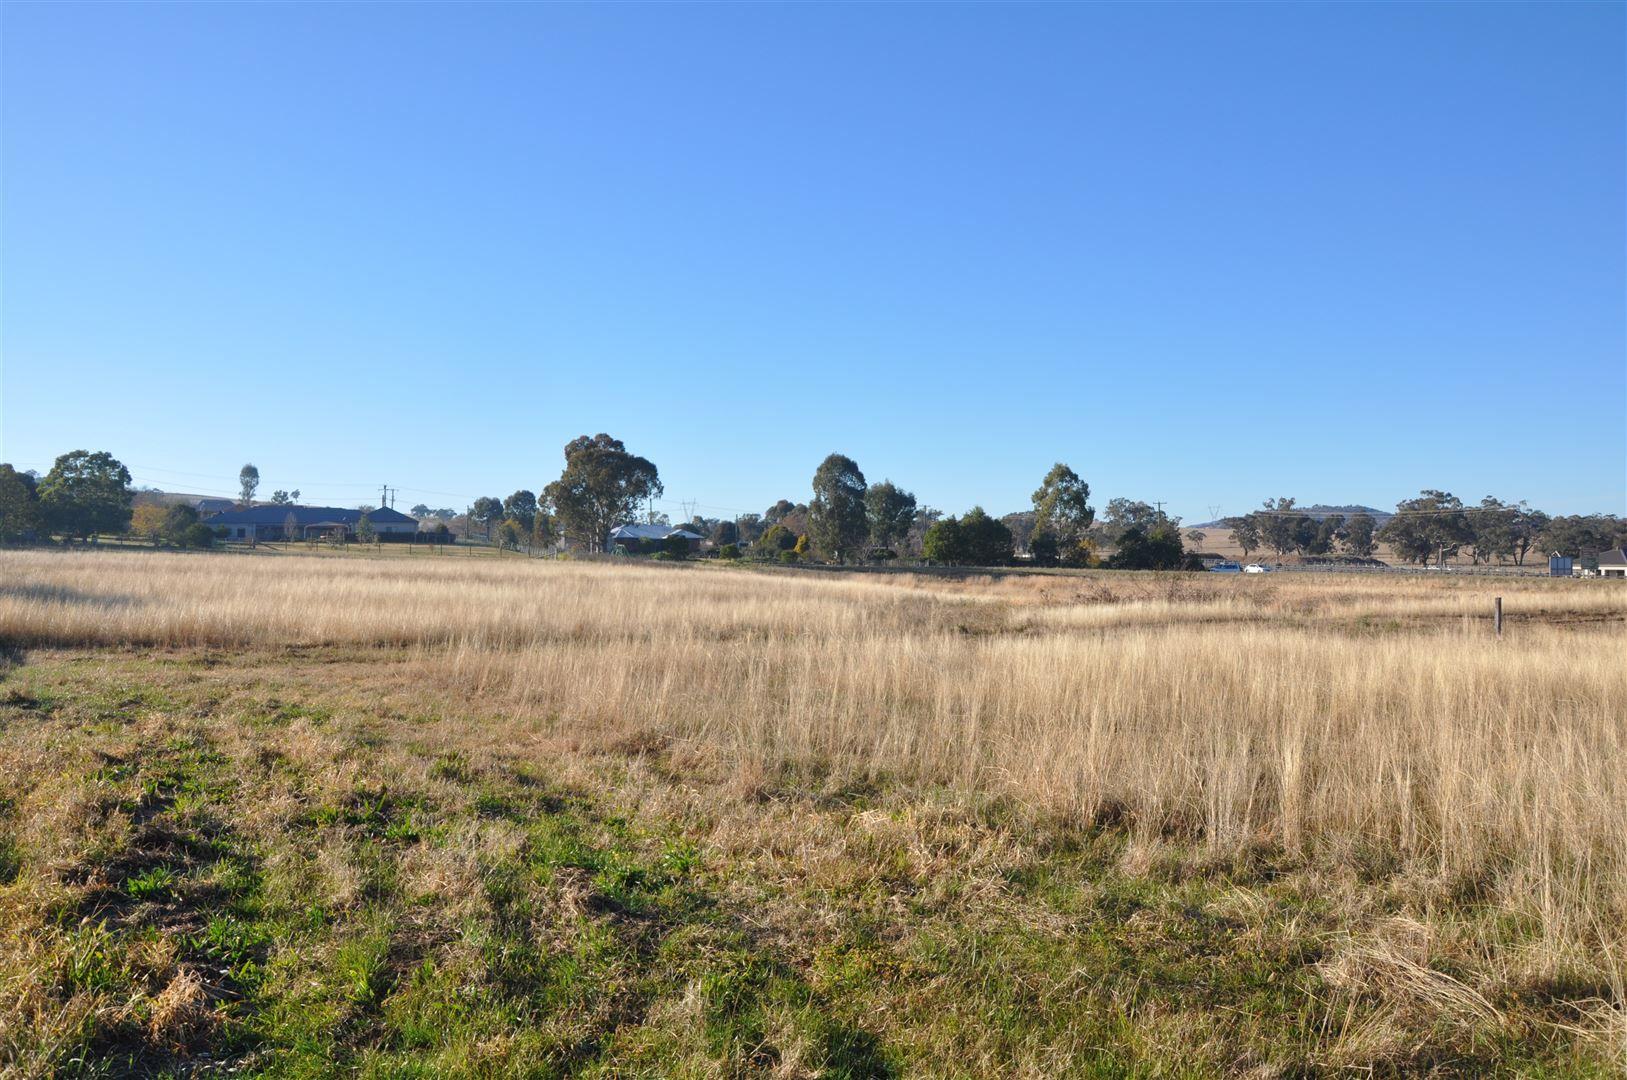 Cnr Barton St & Gundy Rd, Scone NSW 2337, Image 2